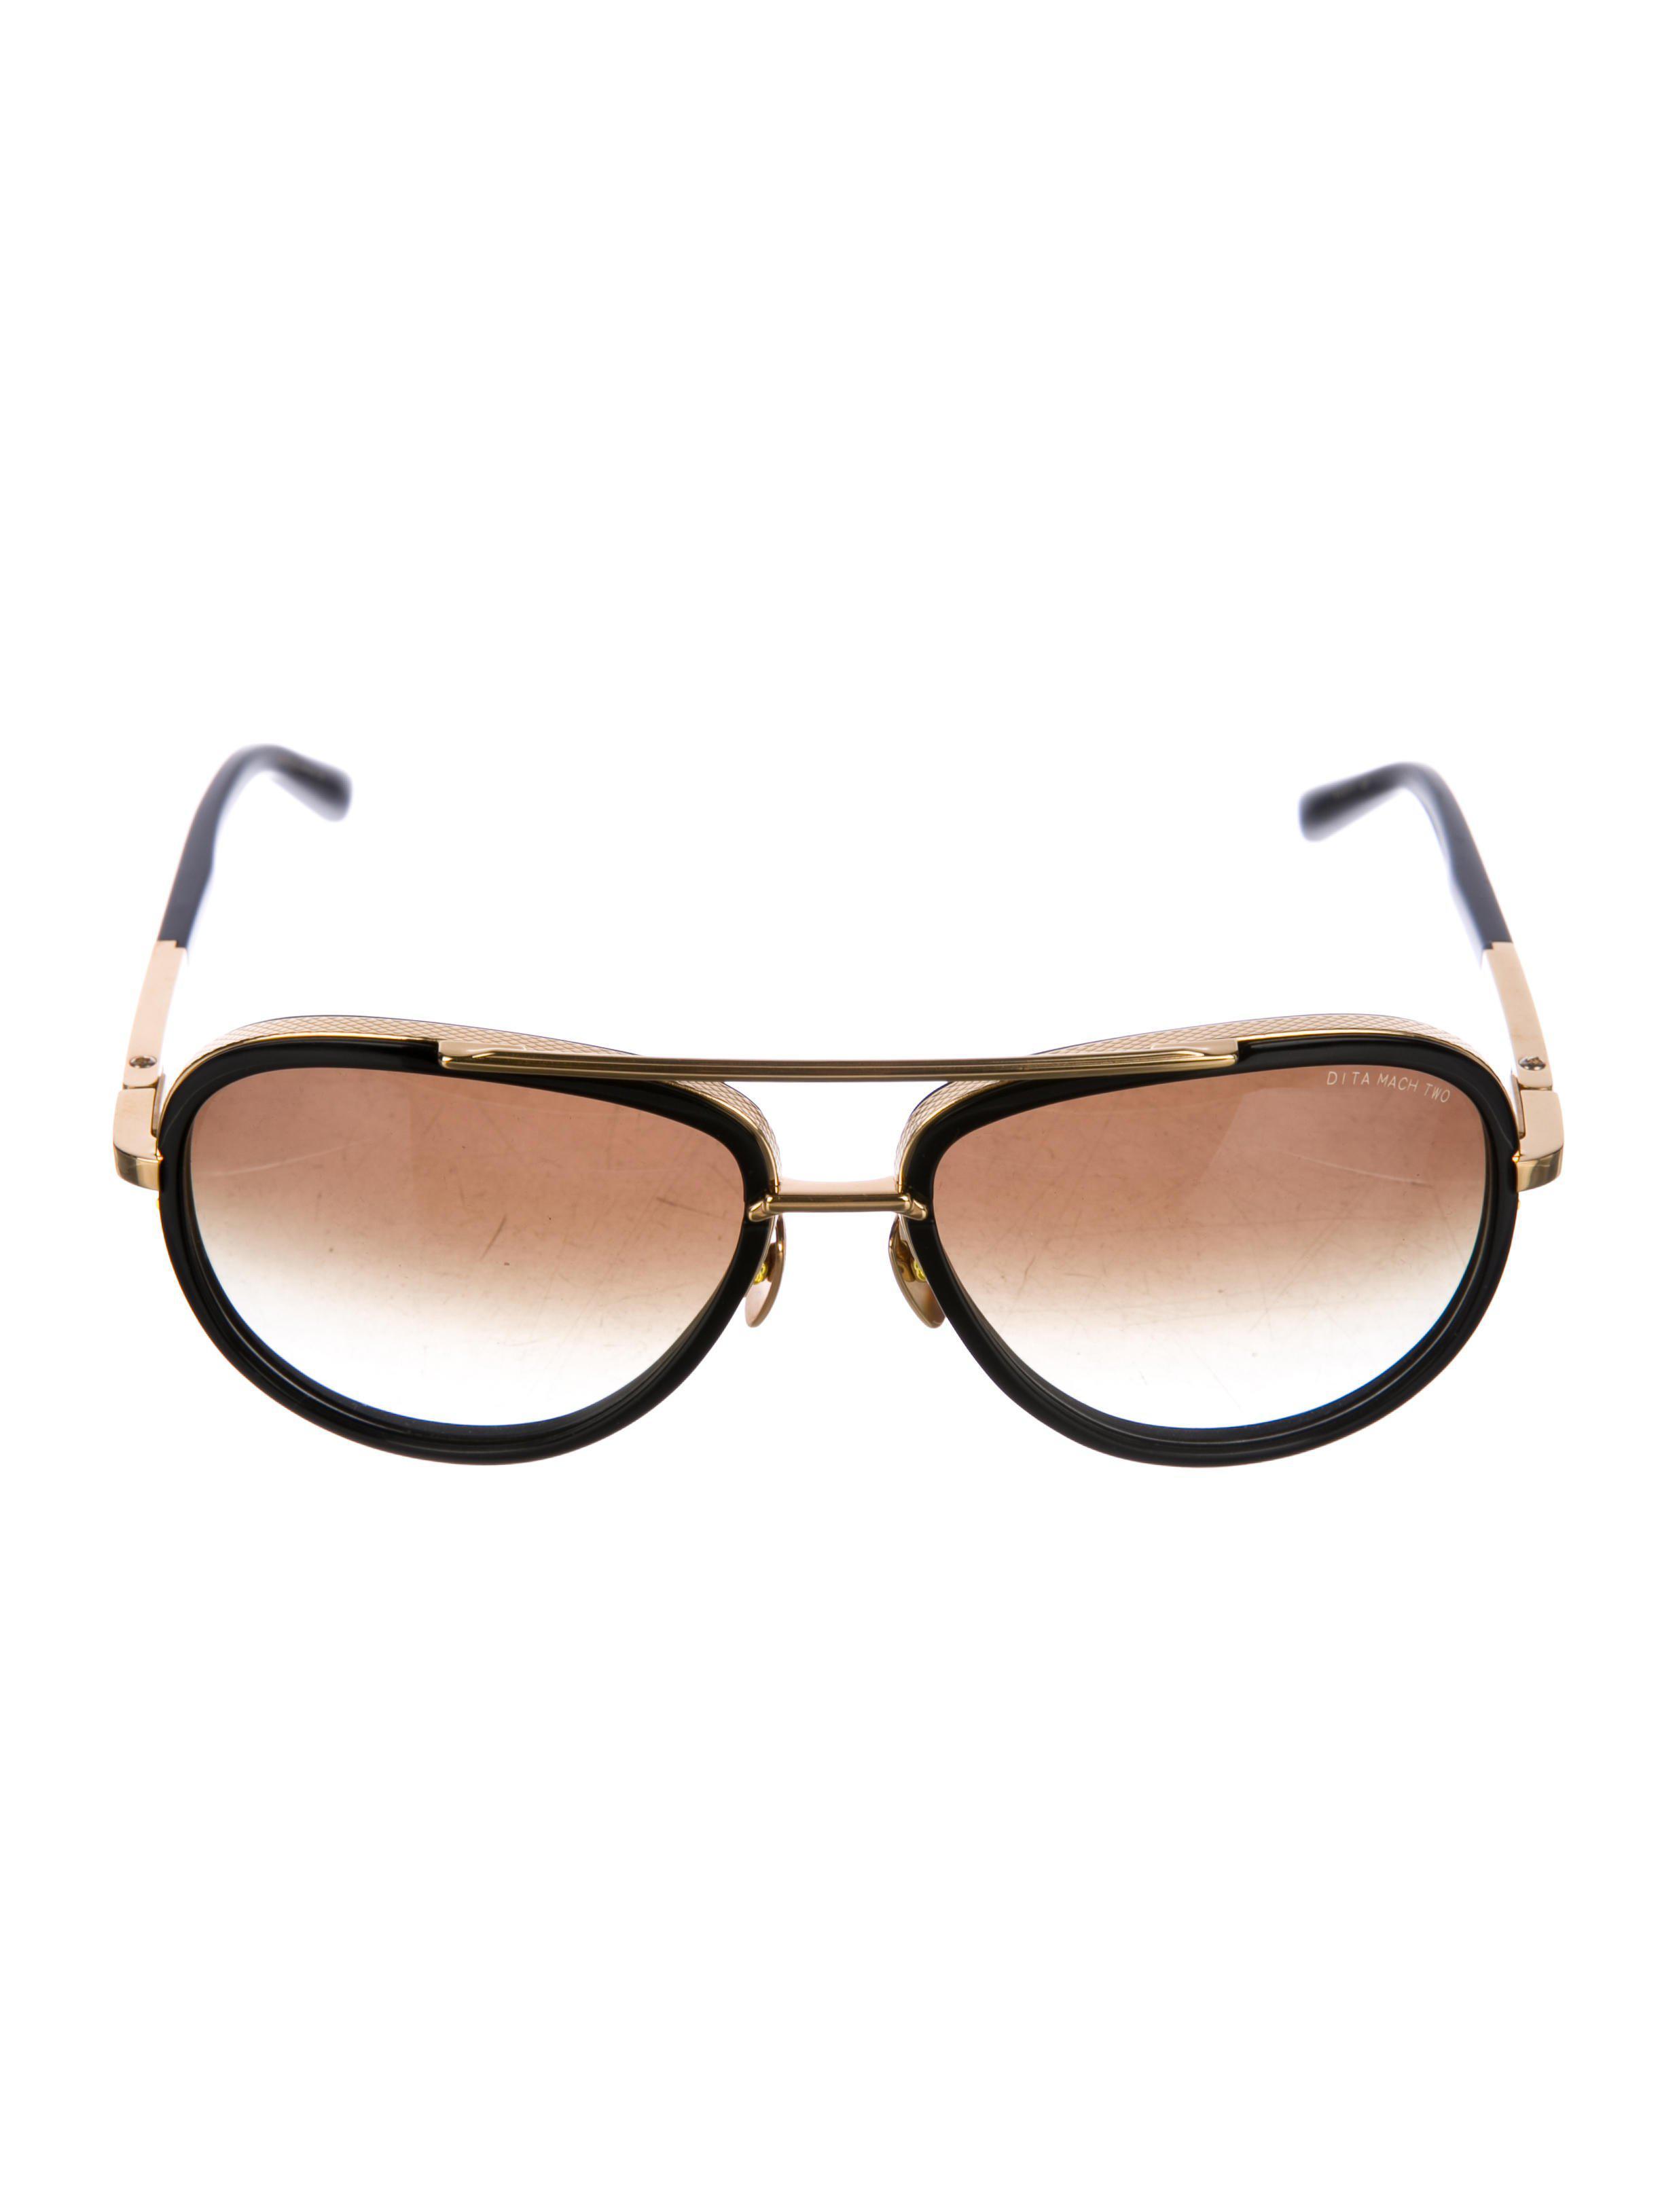 773adbe5eec7 Lyst - Dita 2018 Mach Two Sunglasses Black in Metallic